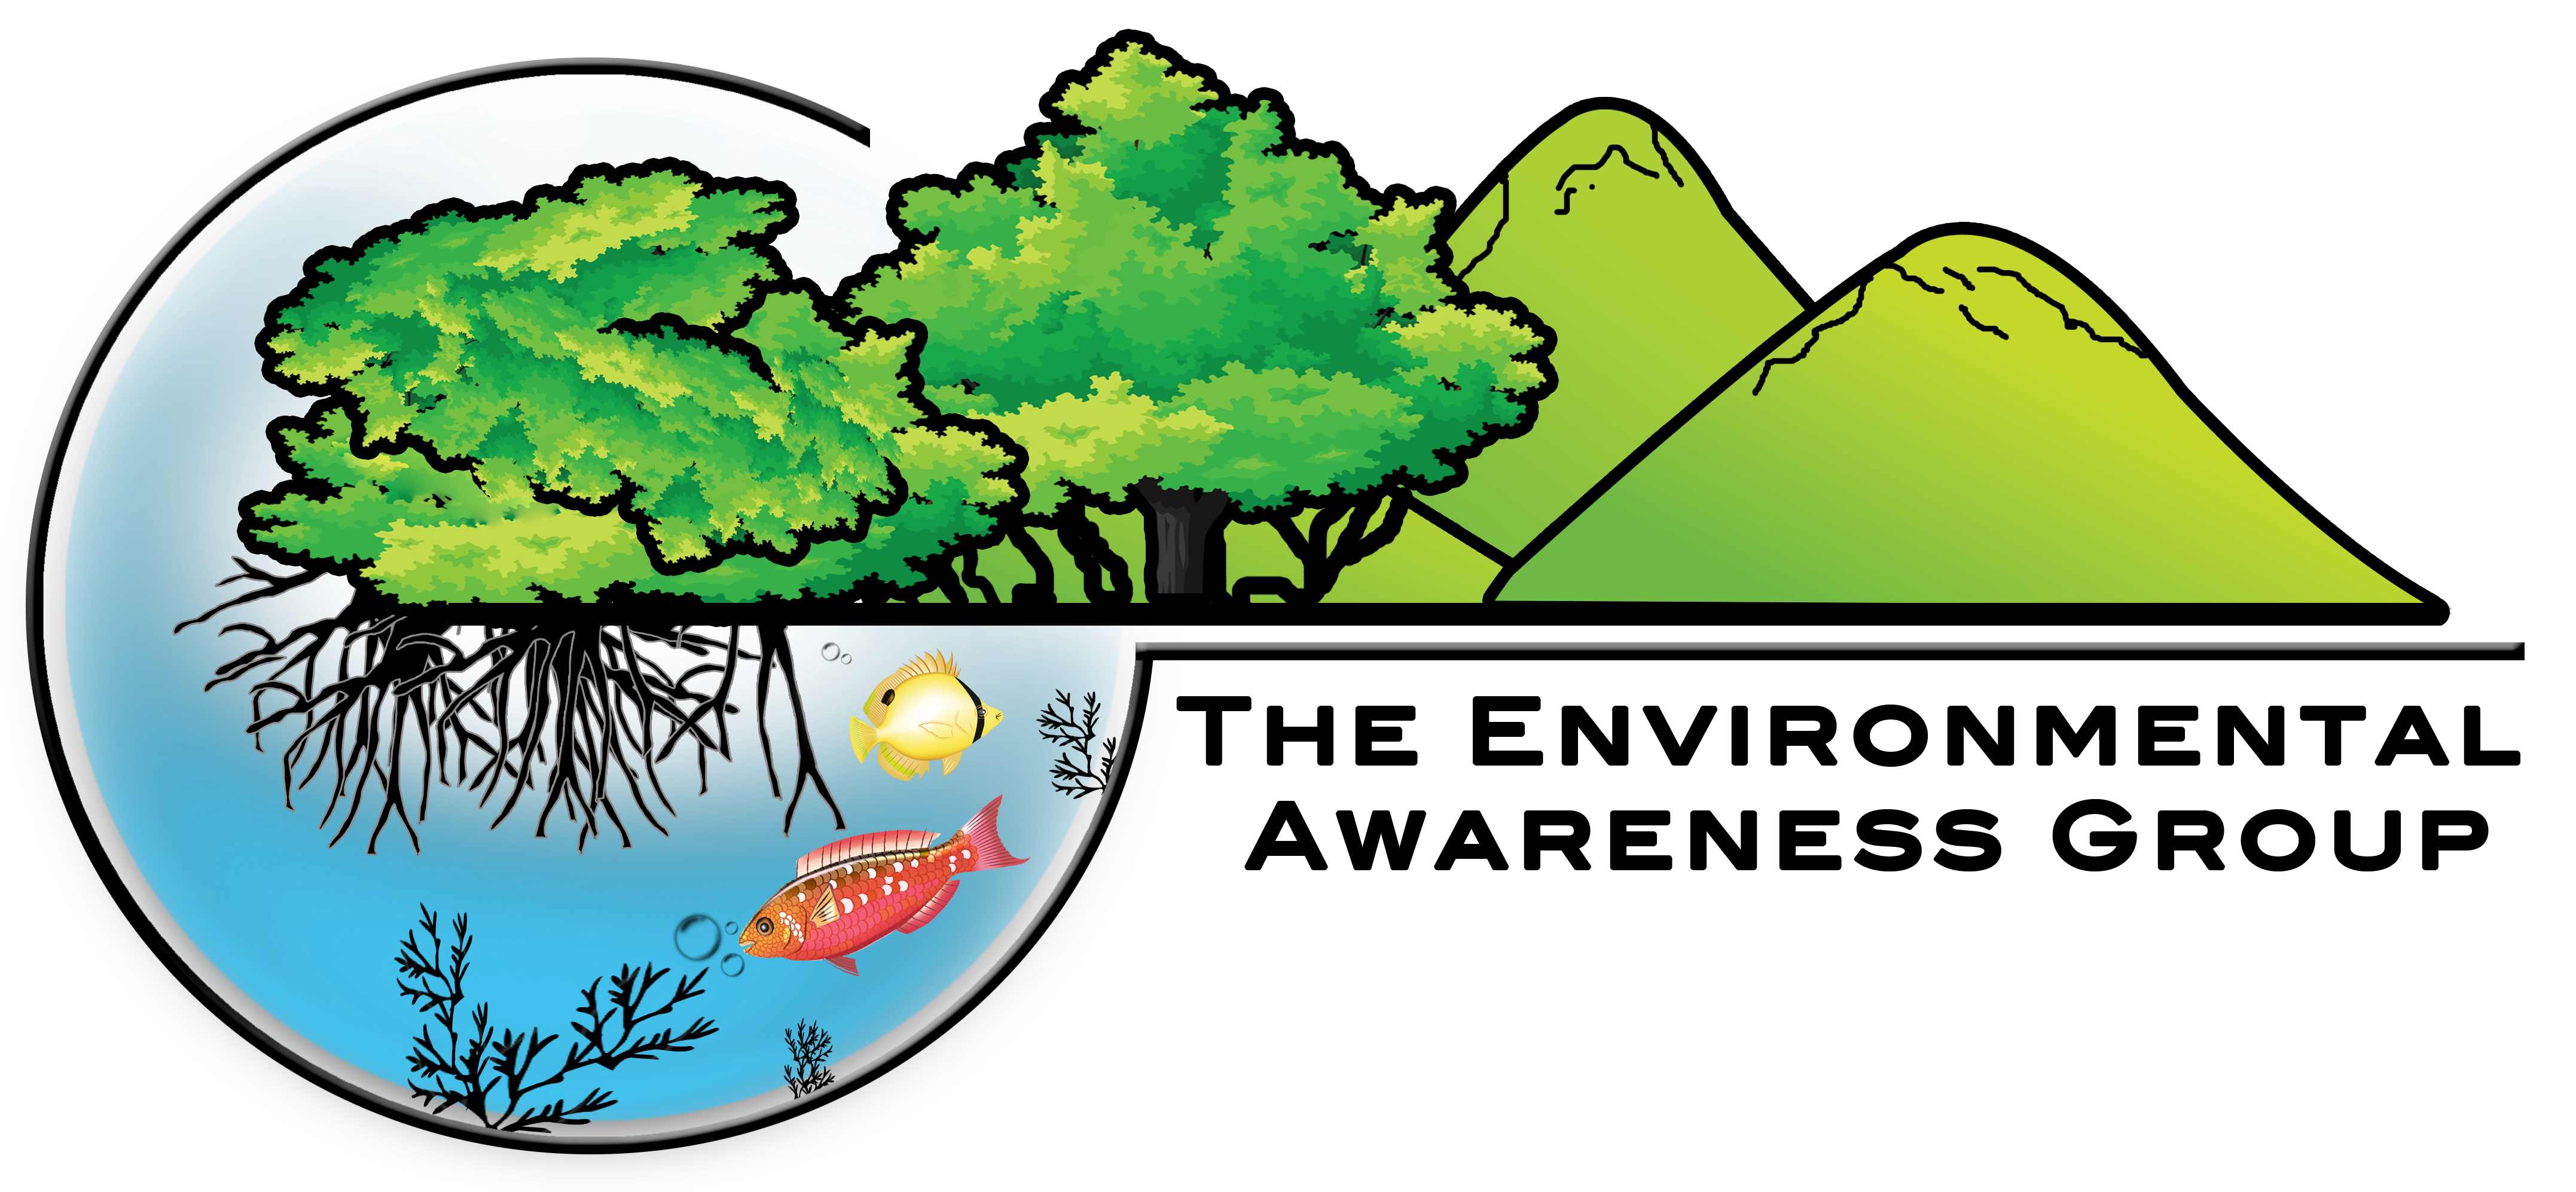 Environment clipart environment logo. Just testing the environmental